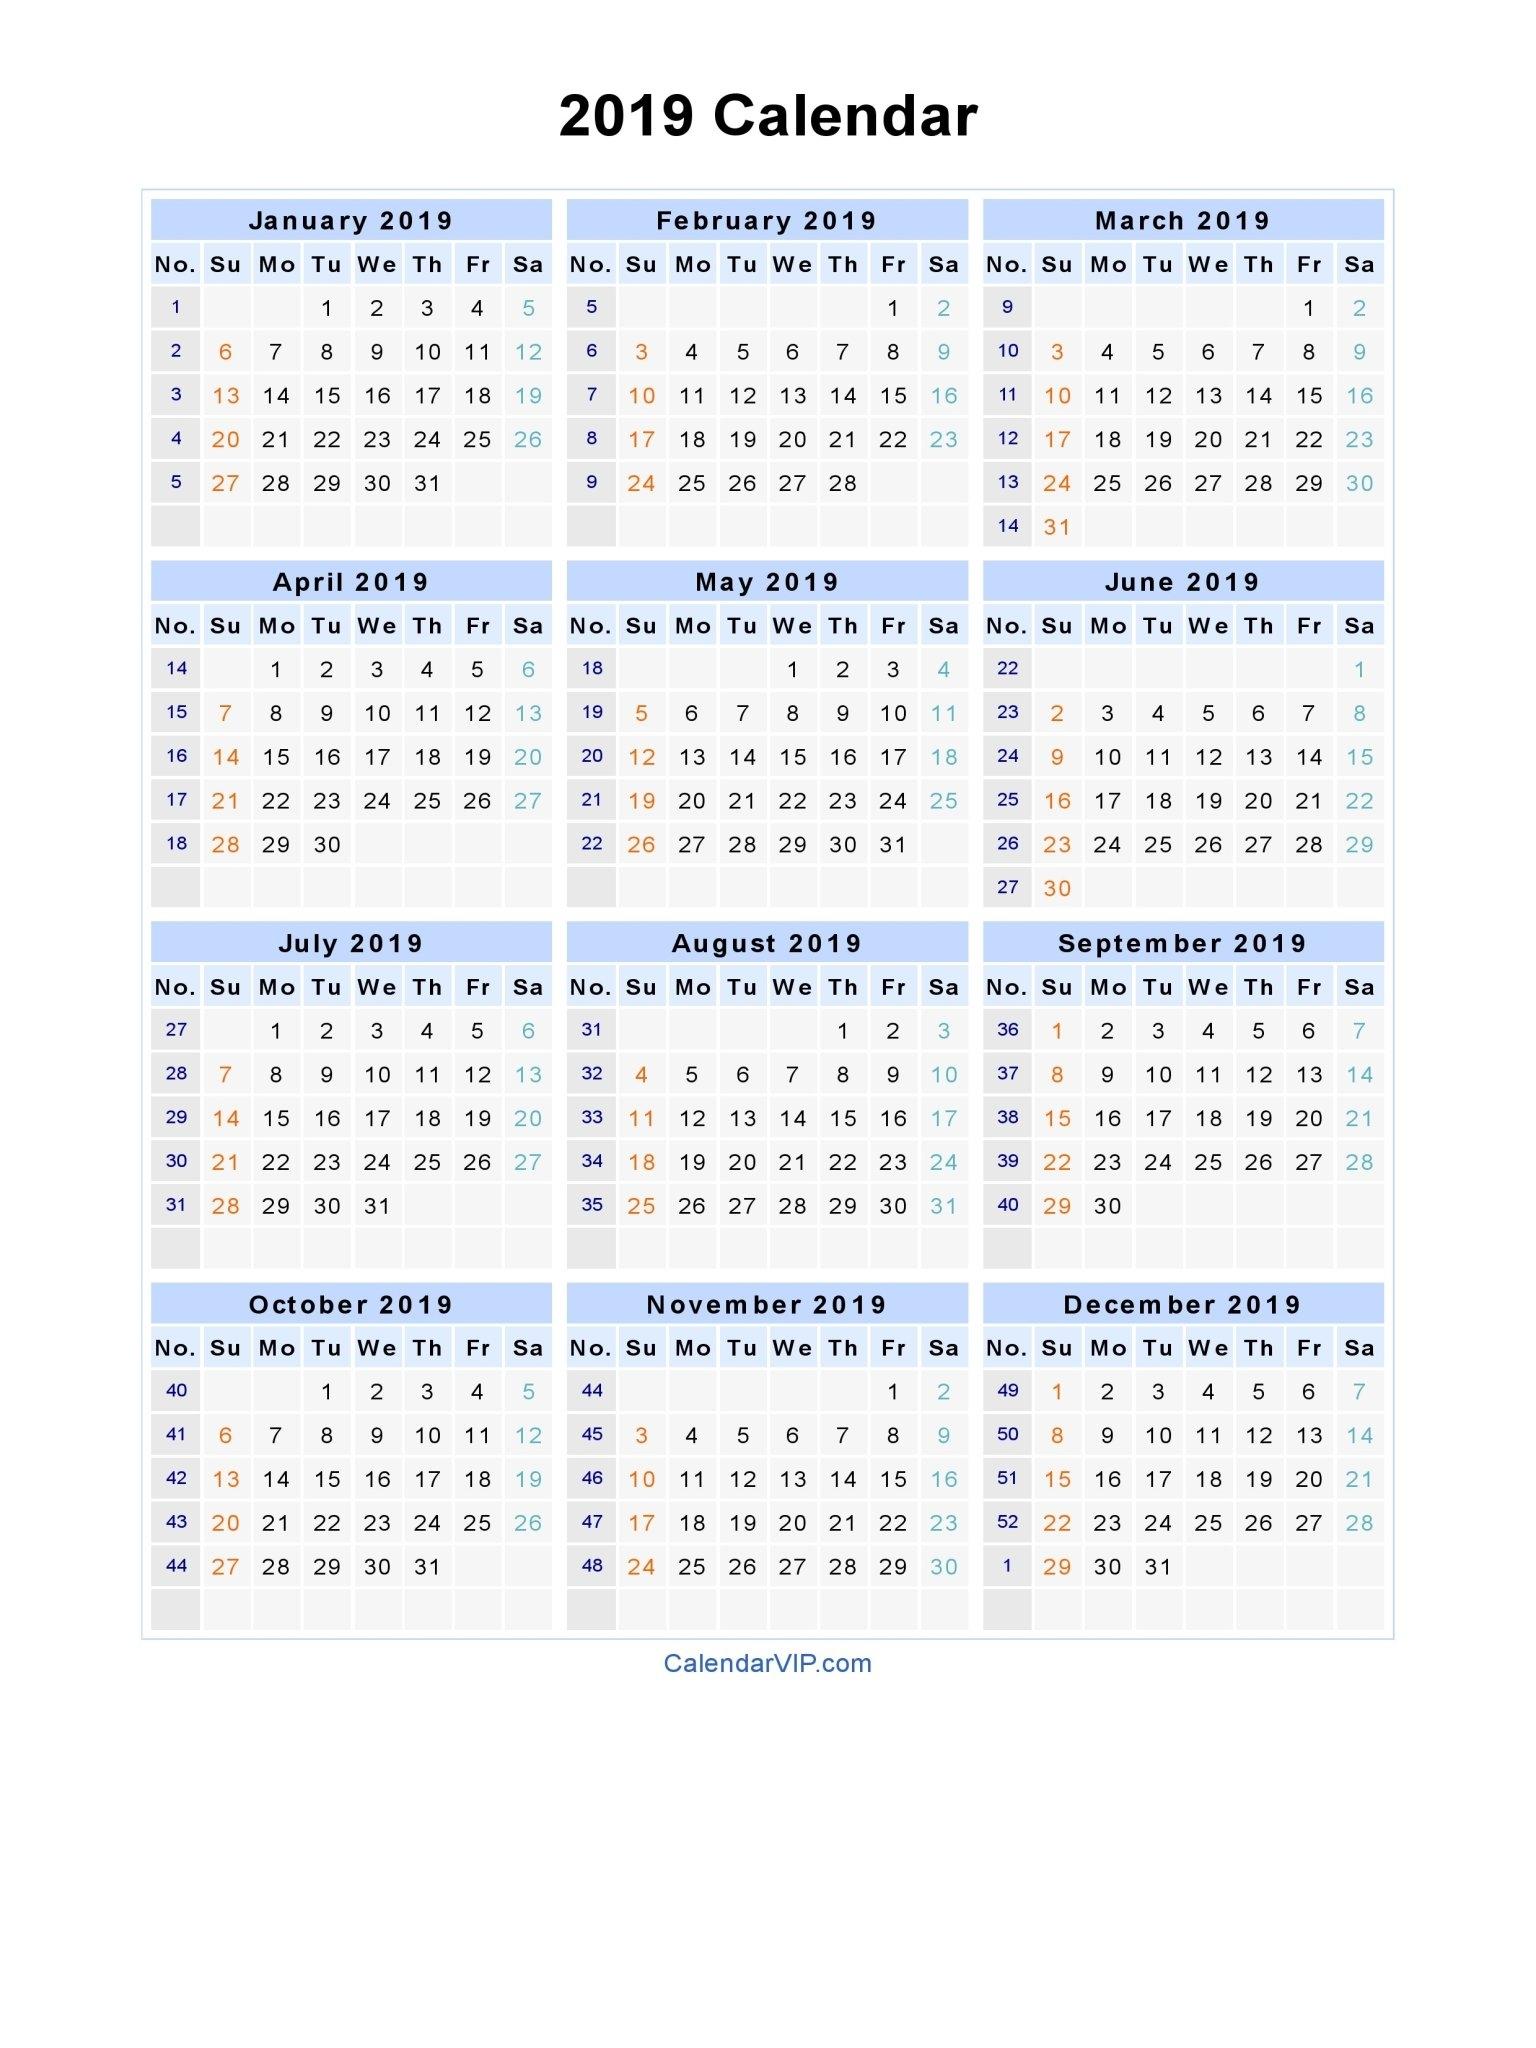 2019 Calendar - Blank Printable Calendar Template In Pdf Word Excel Calendar 2019 Editable Word